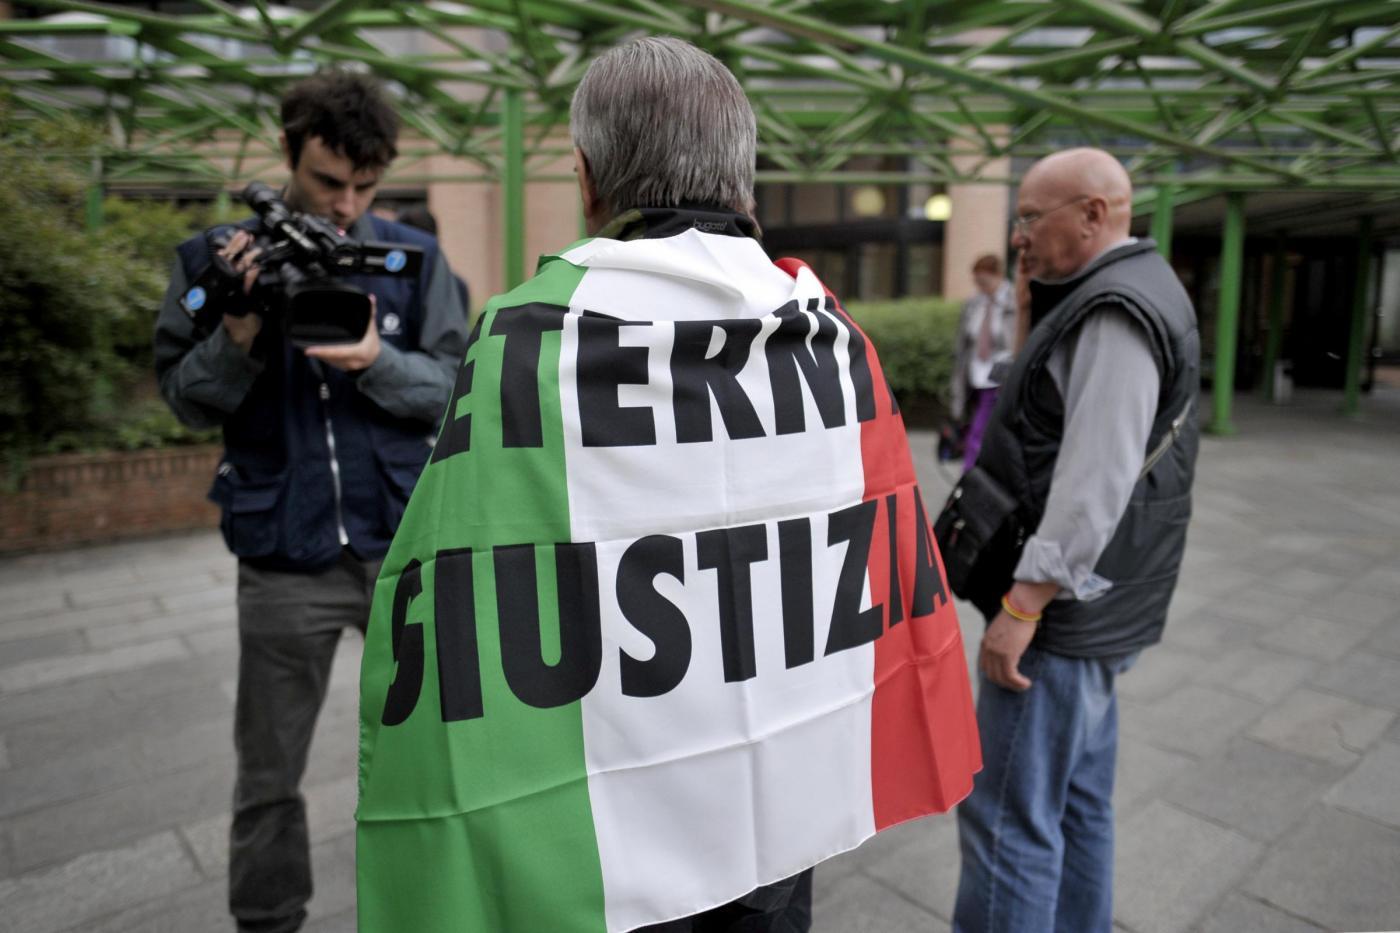 Processo Eternit Bis, al tribunale di Torino